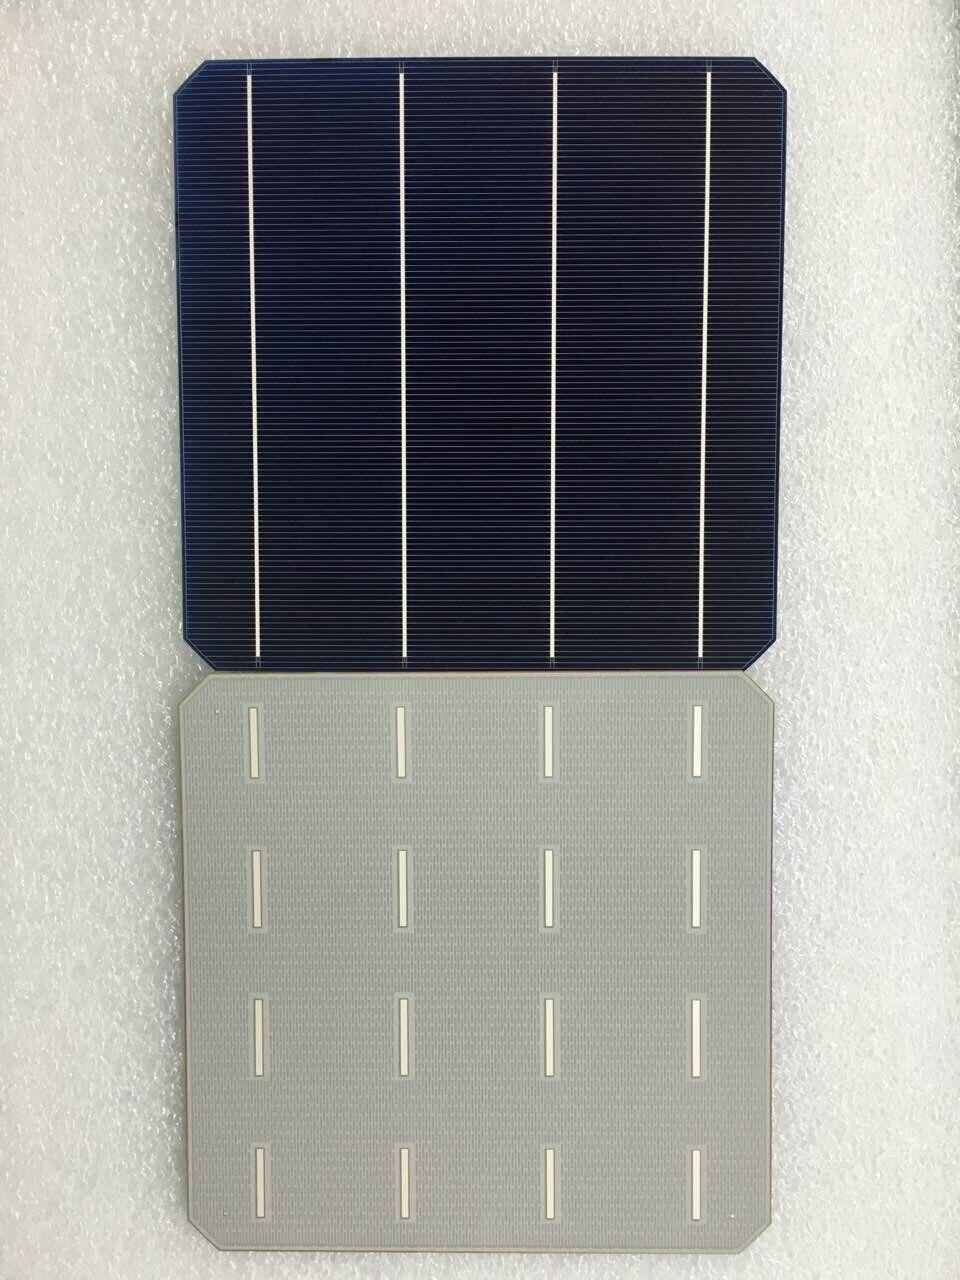 Promotion 50pcs 20 6 5W 156 75mm 4BB Monocrystalline Solar cell for DIY solar panel